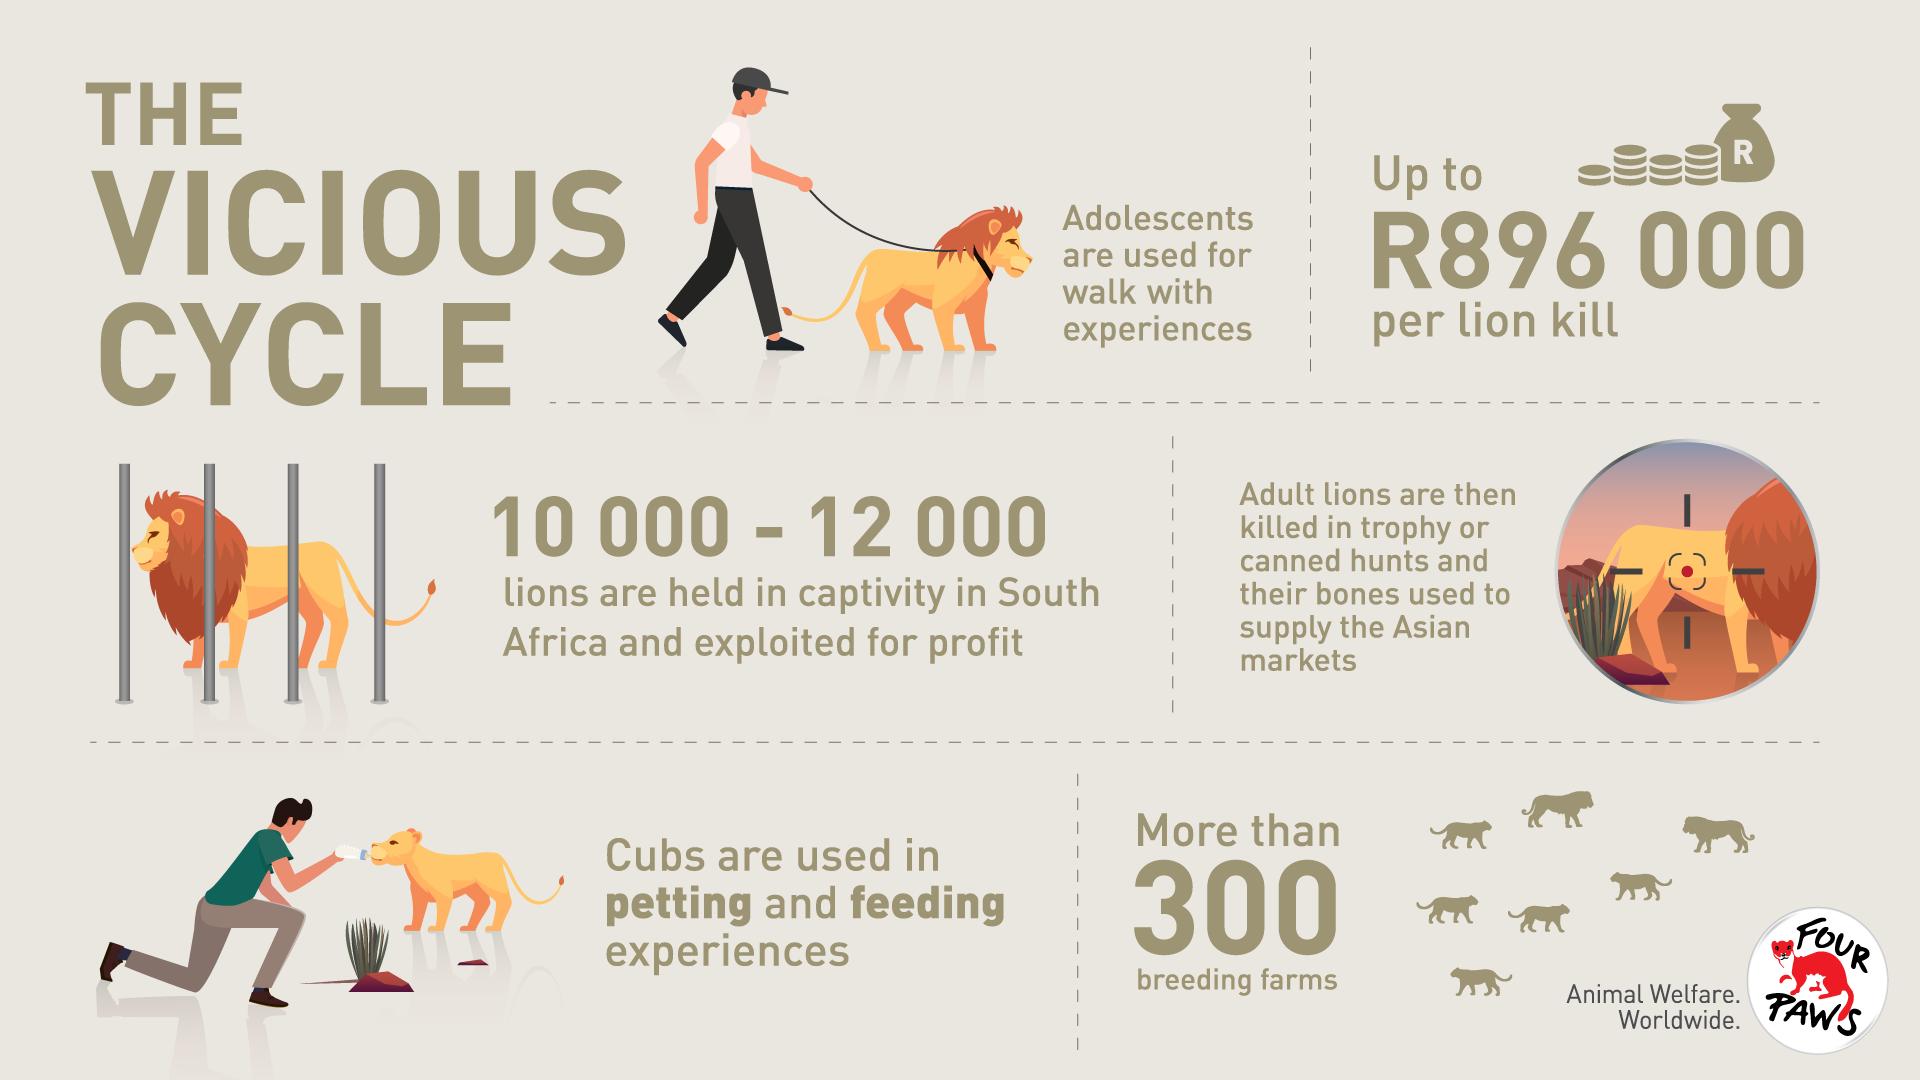 Animal Charity - Vicious Cycle